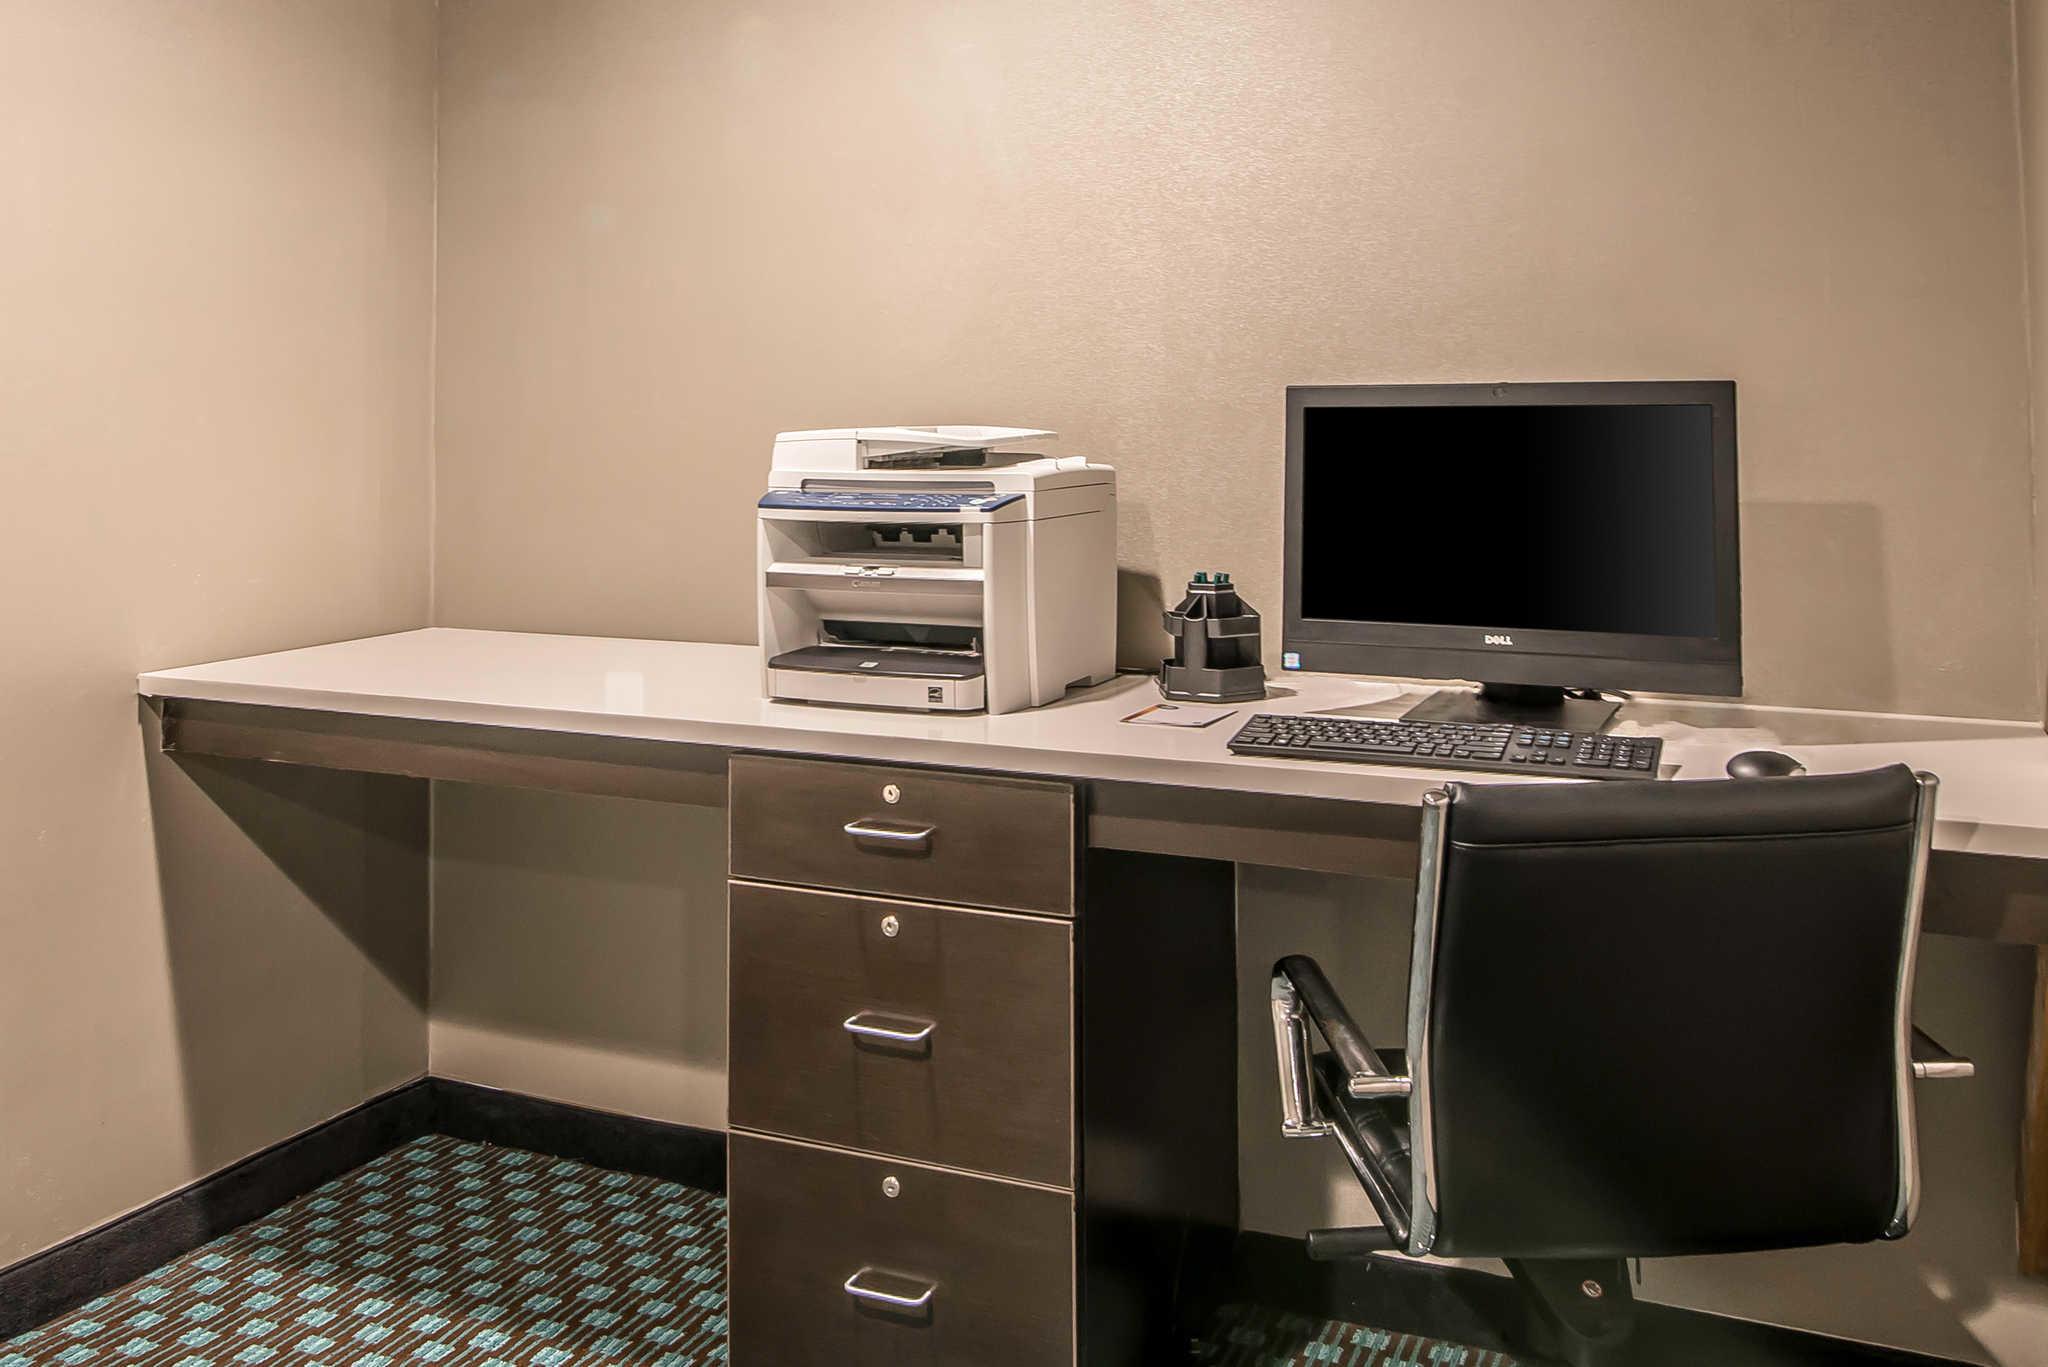 Quality Inn & Suites - Ruidoso Hwy 70 image 29